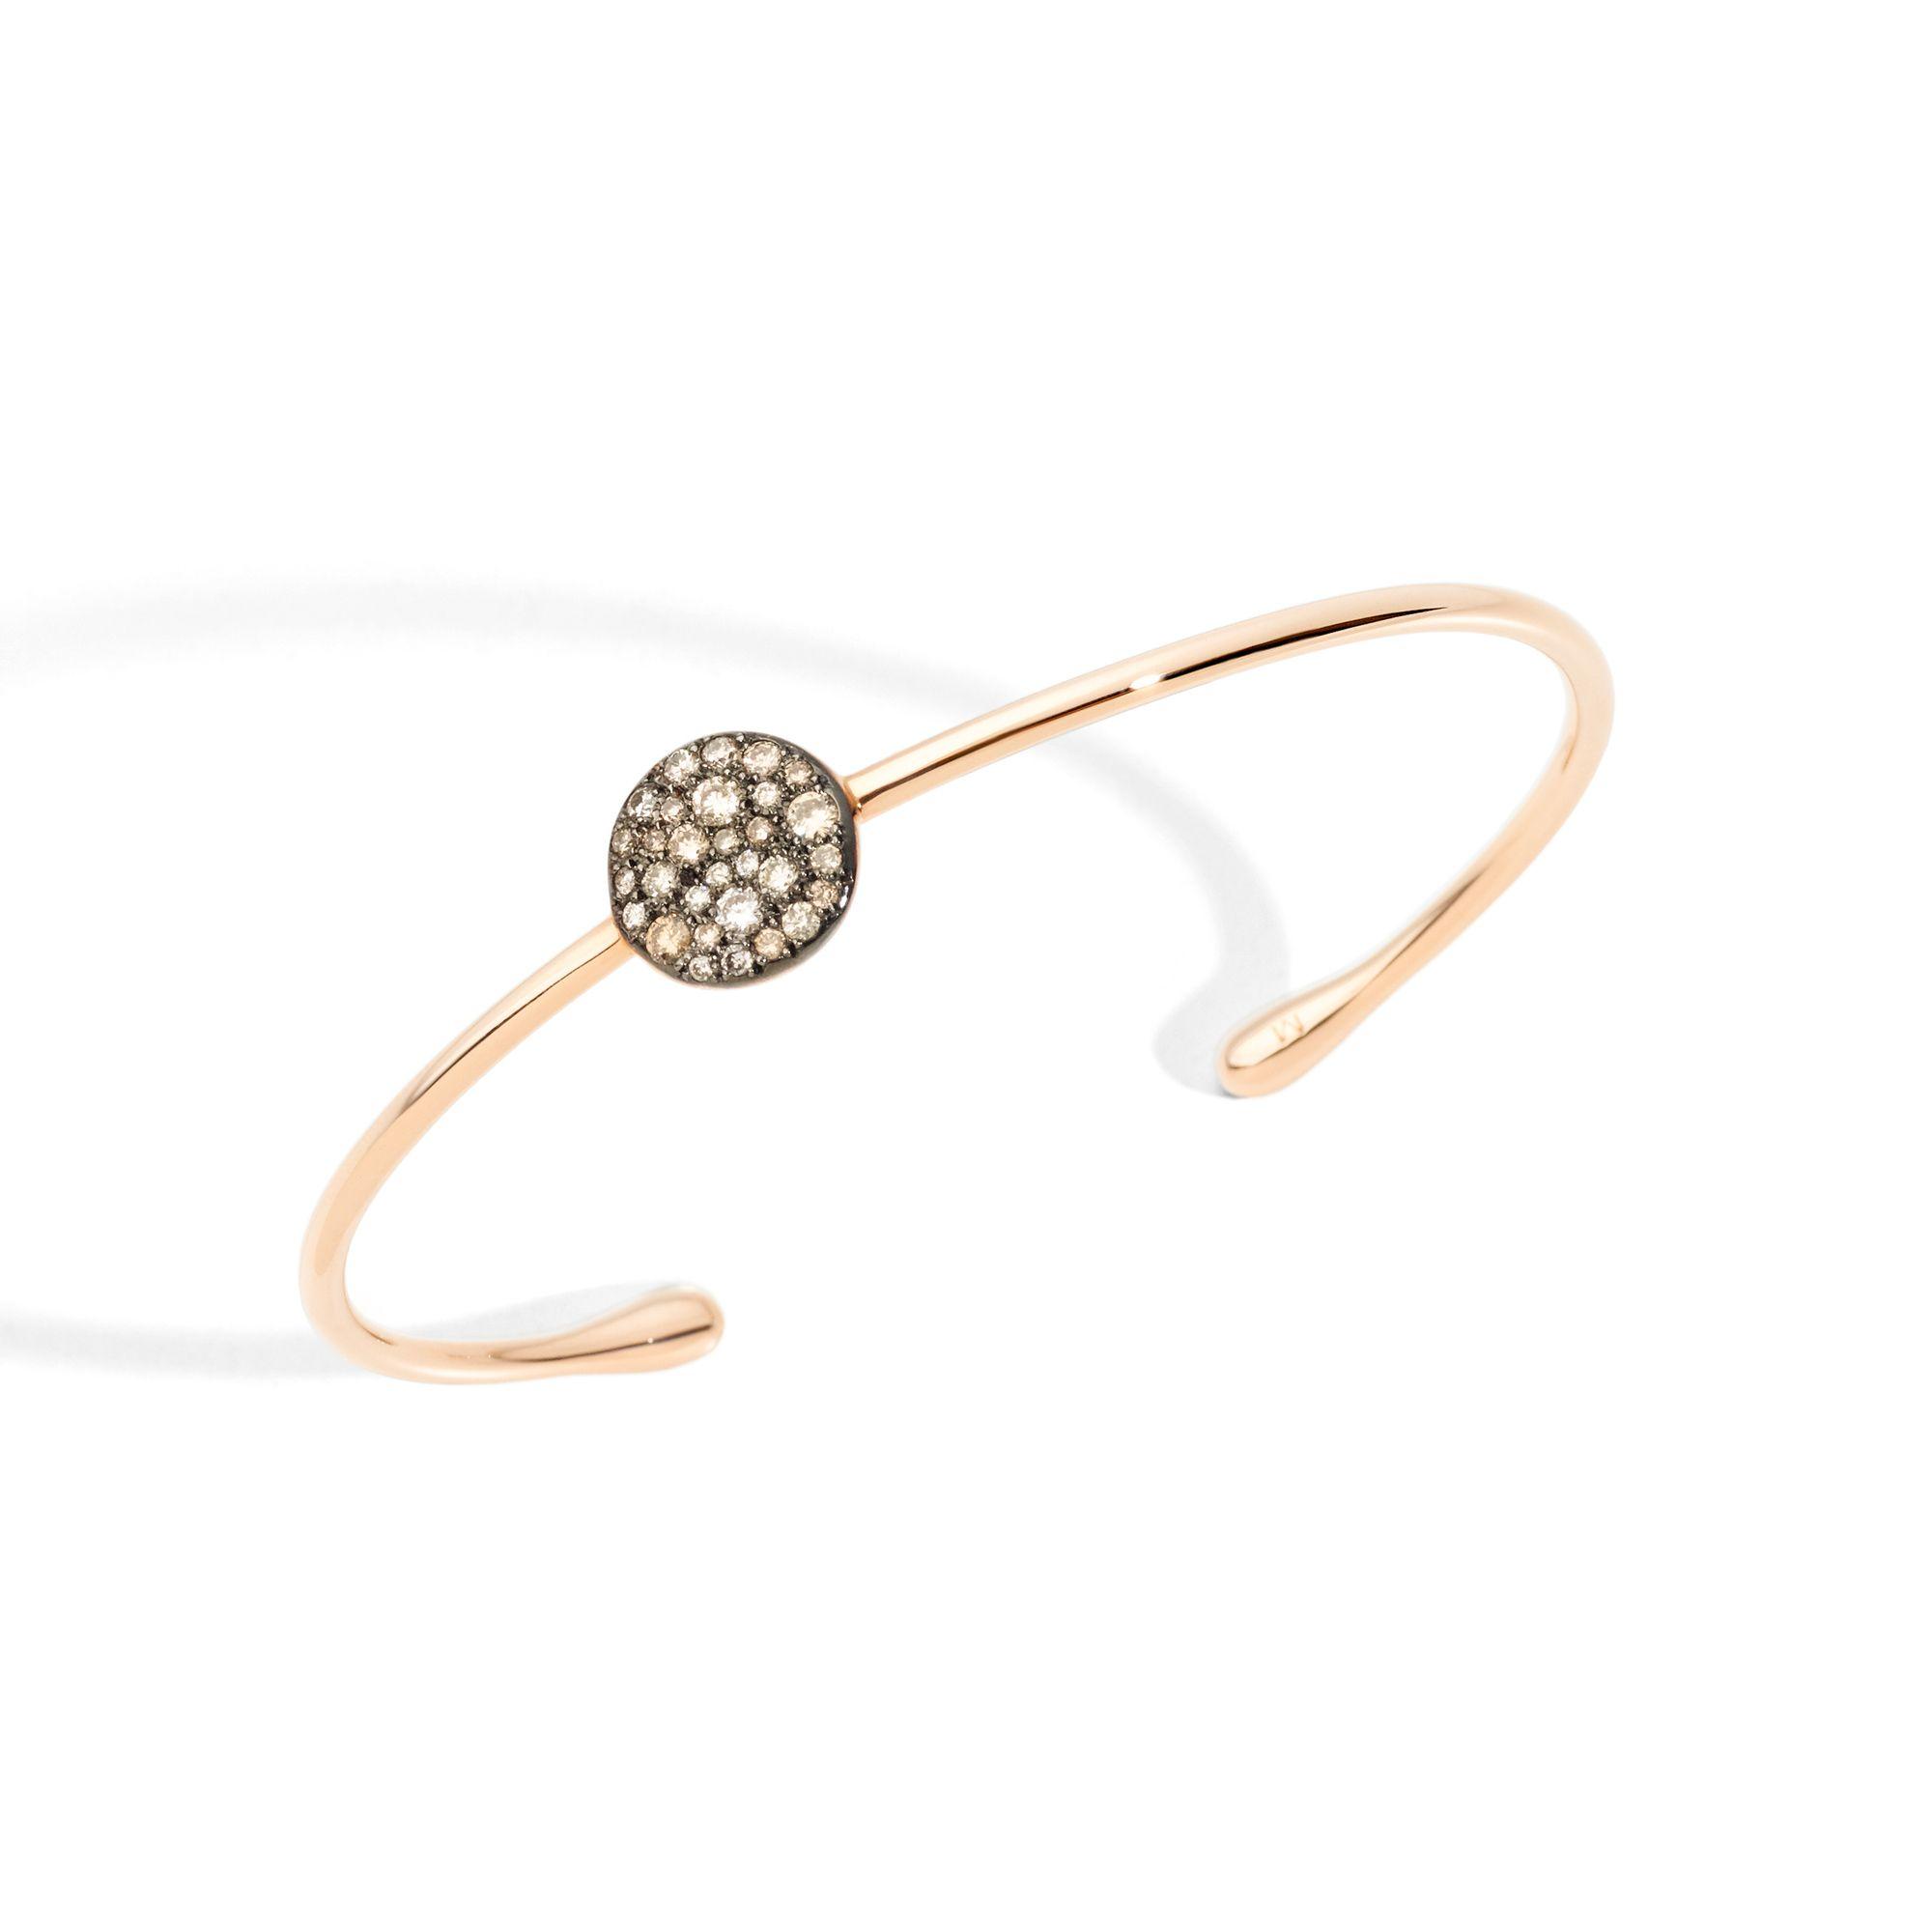 Bracelet Pomellato Sabbia en or rose et diamants bruns